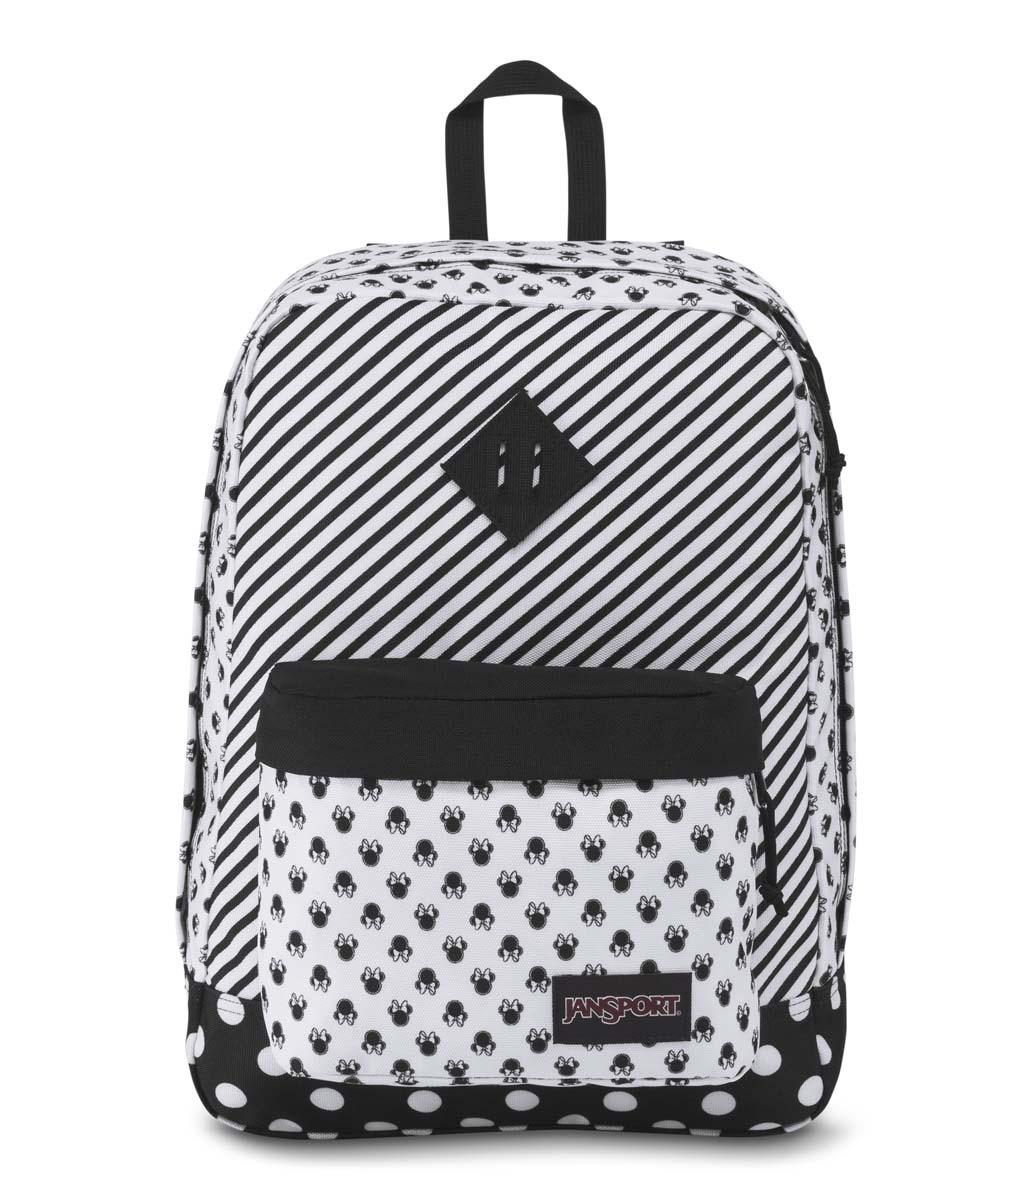 JanSport กระเป๋าเป้ รุ่น Super FX - Disney Minnie White Bow Dot